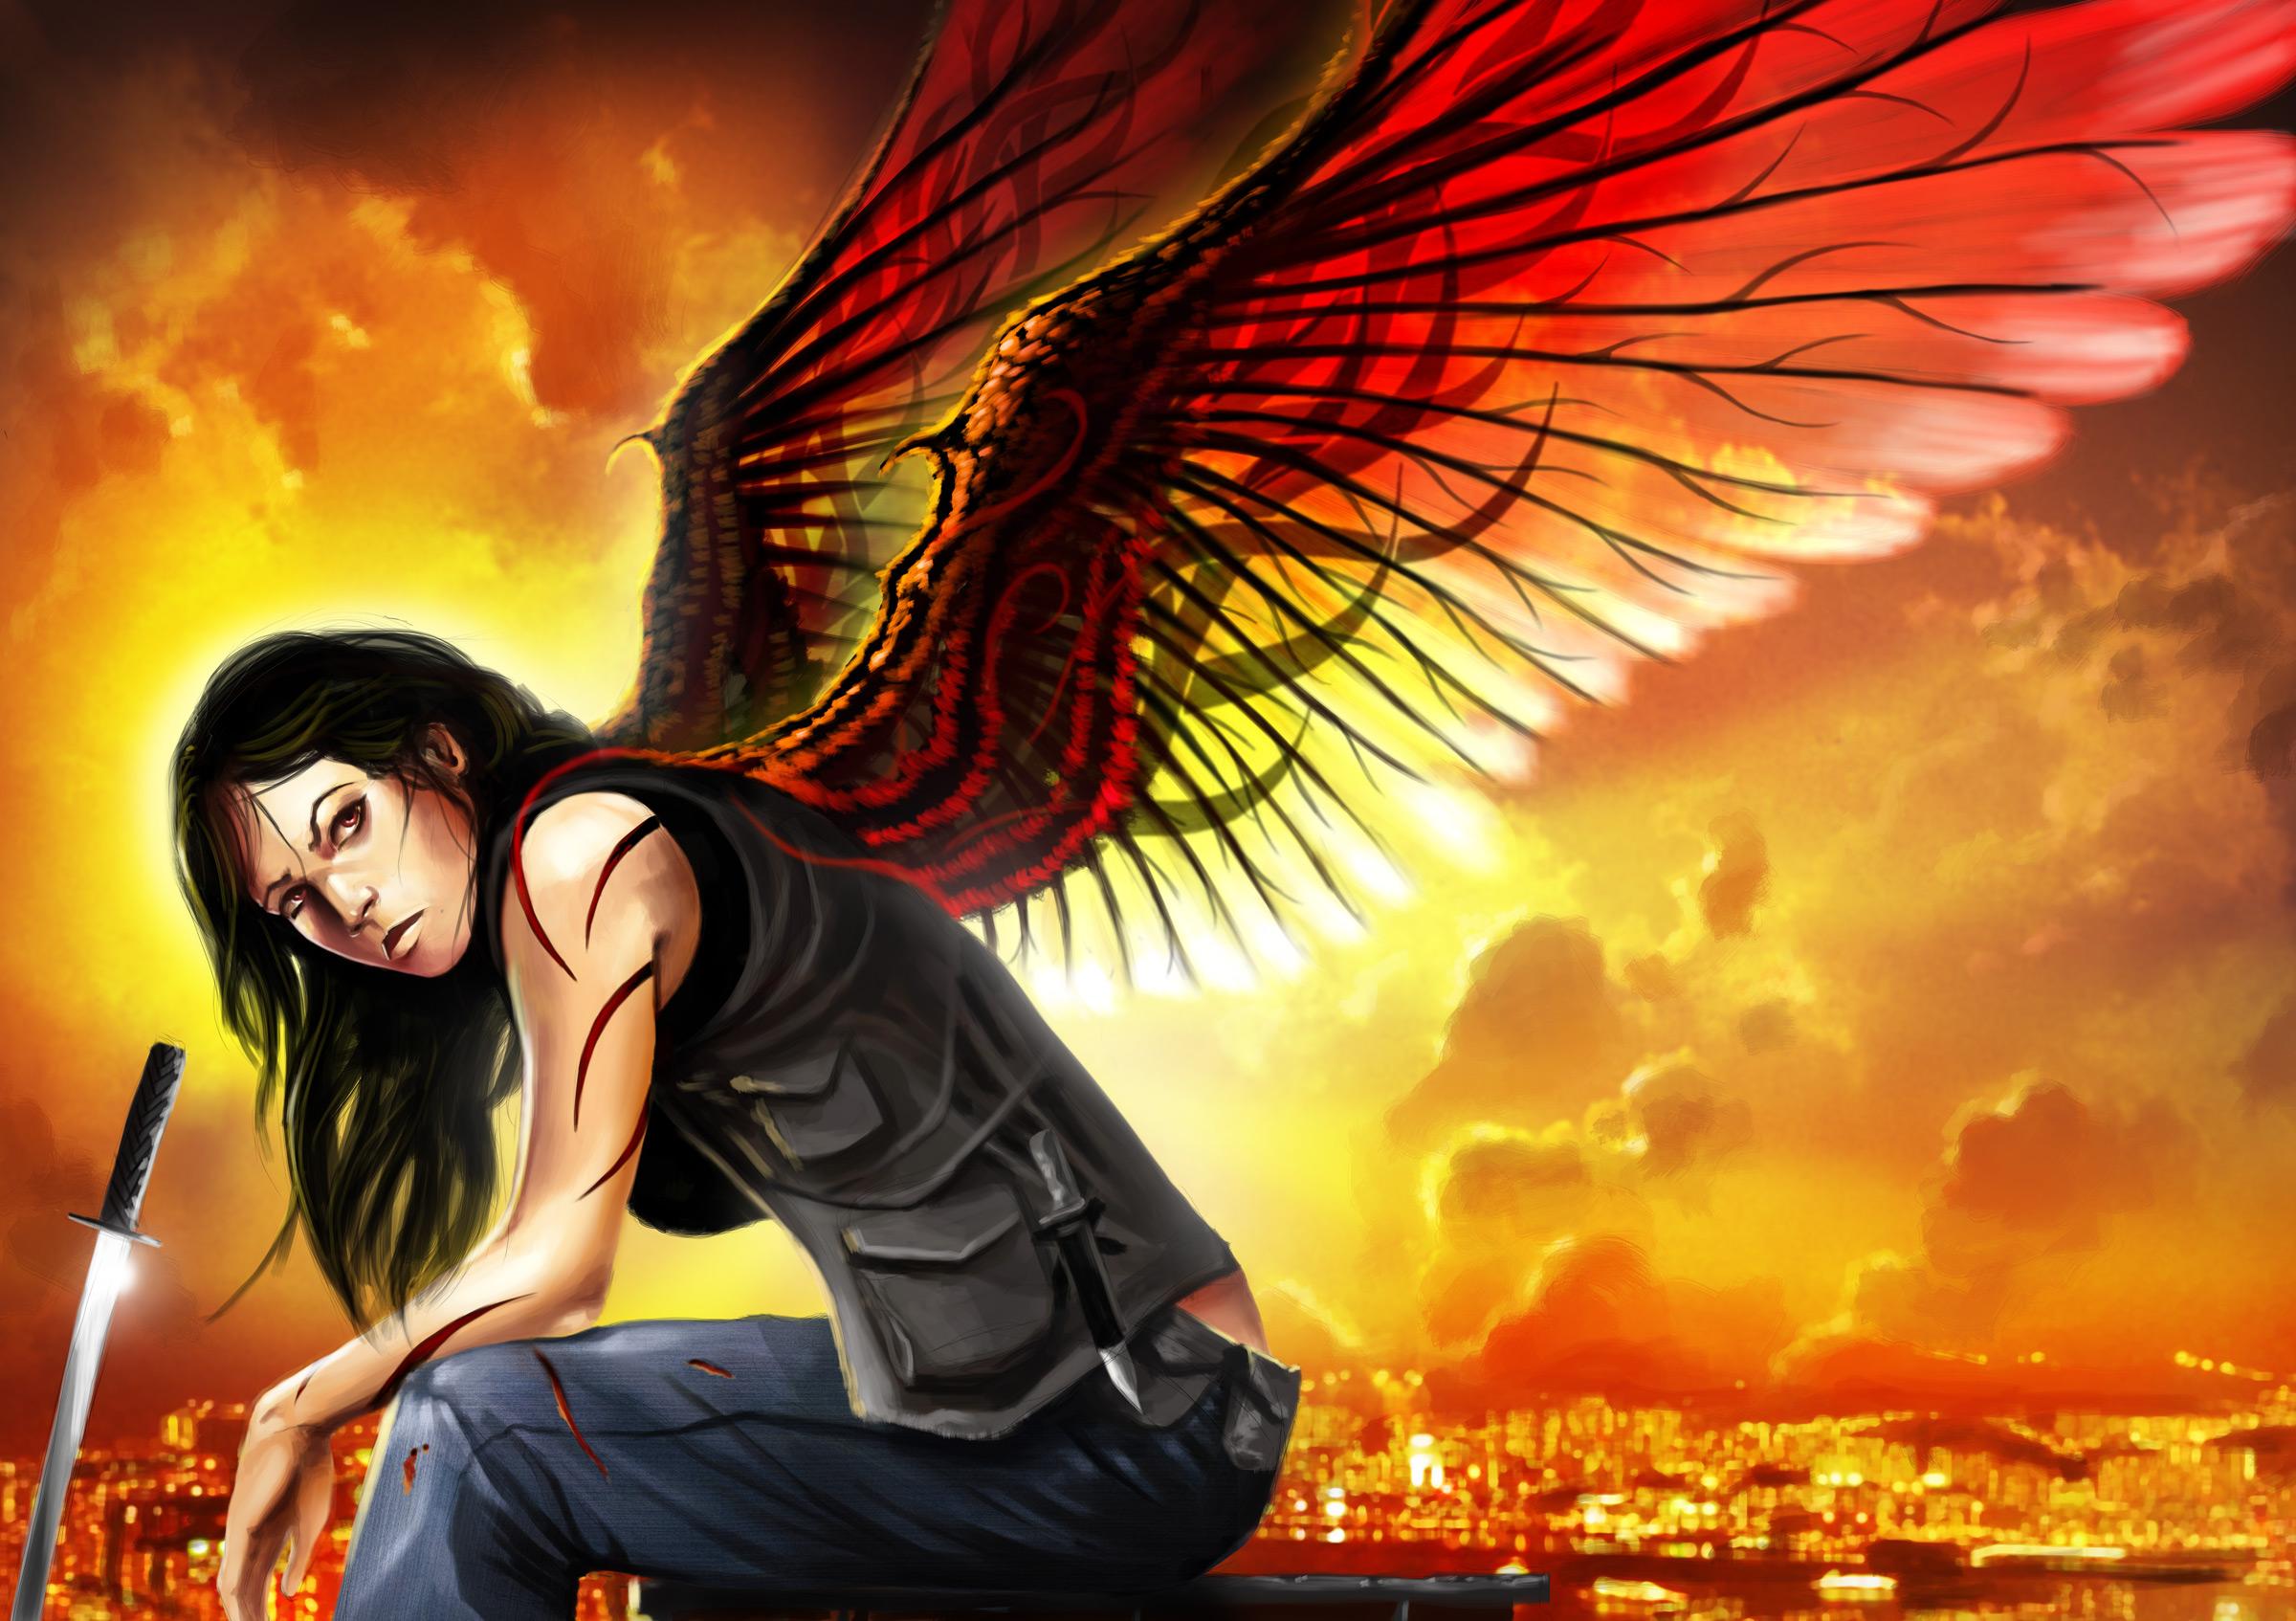 Fantasy Angel Warrior 2400x1694